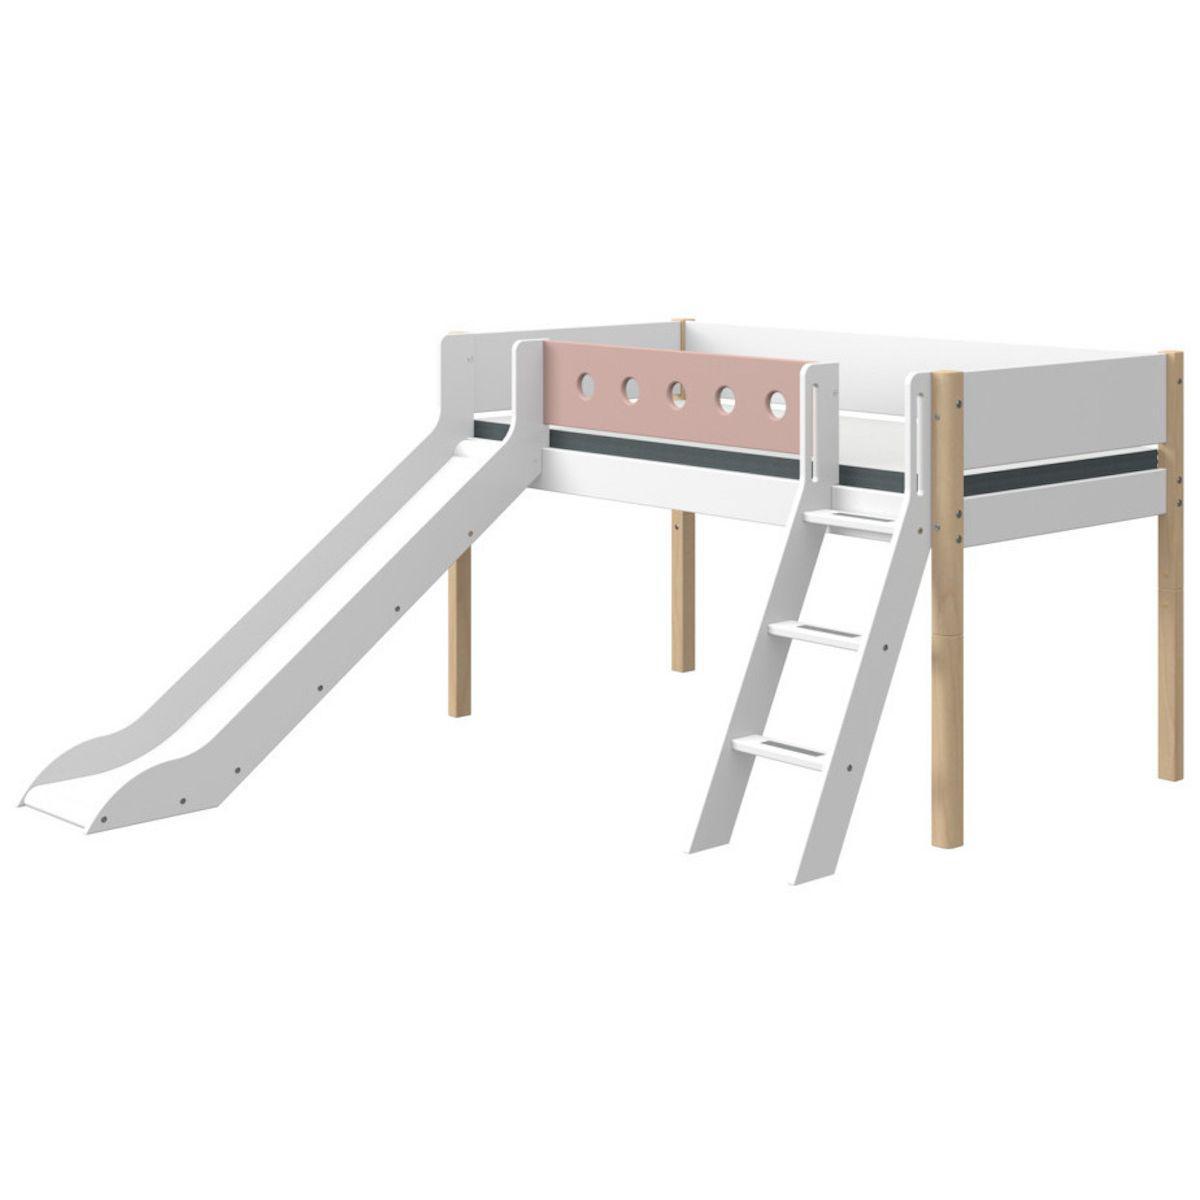 Cama media alta 90x190cm escalera inclinada-tobogán WHITE Flexa natural-rosa claro